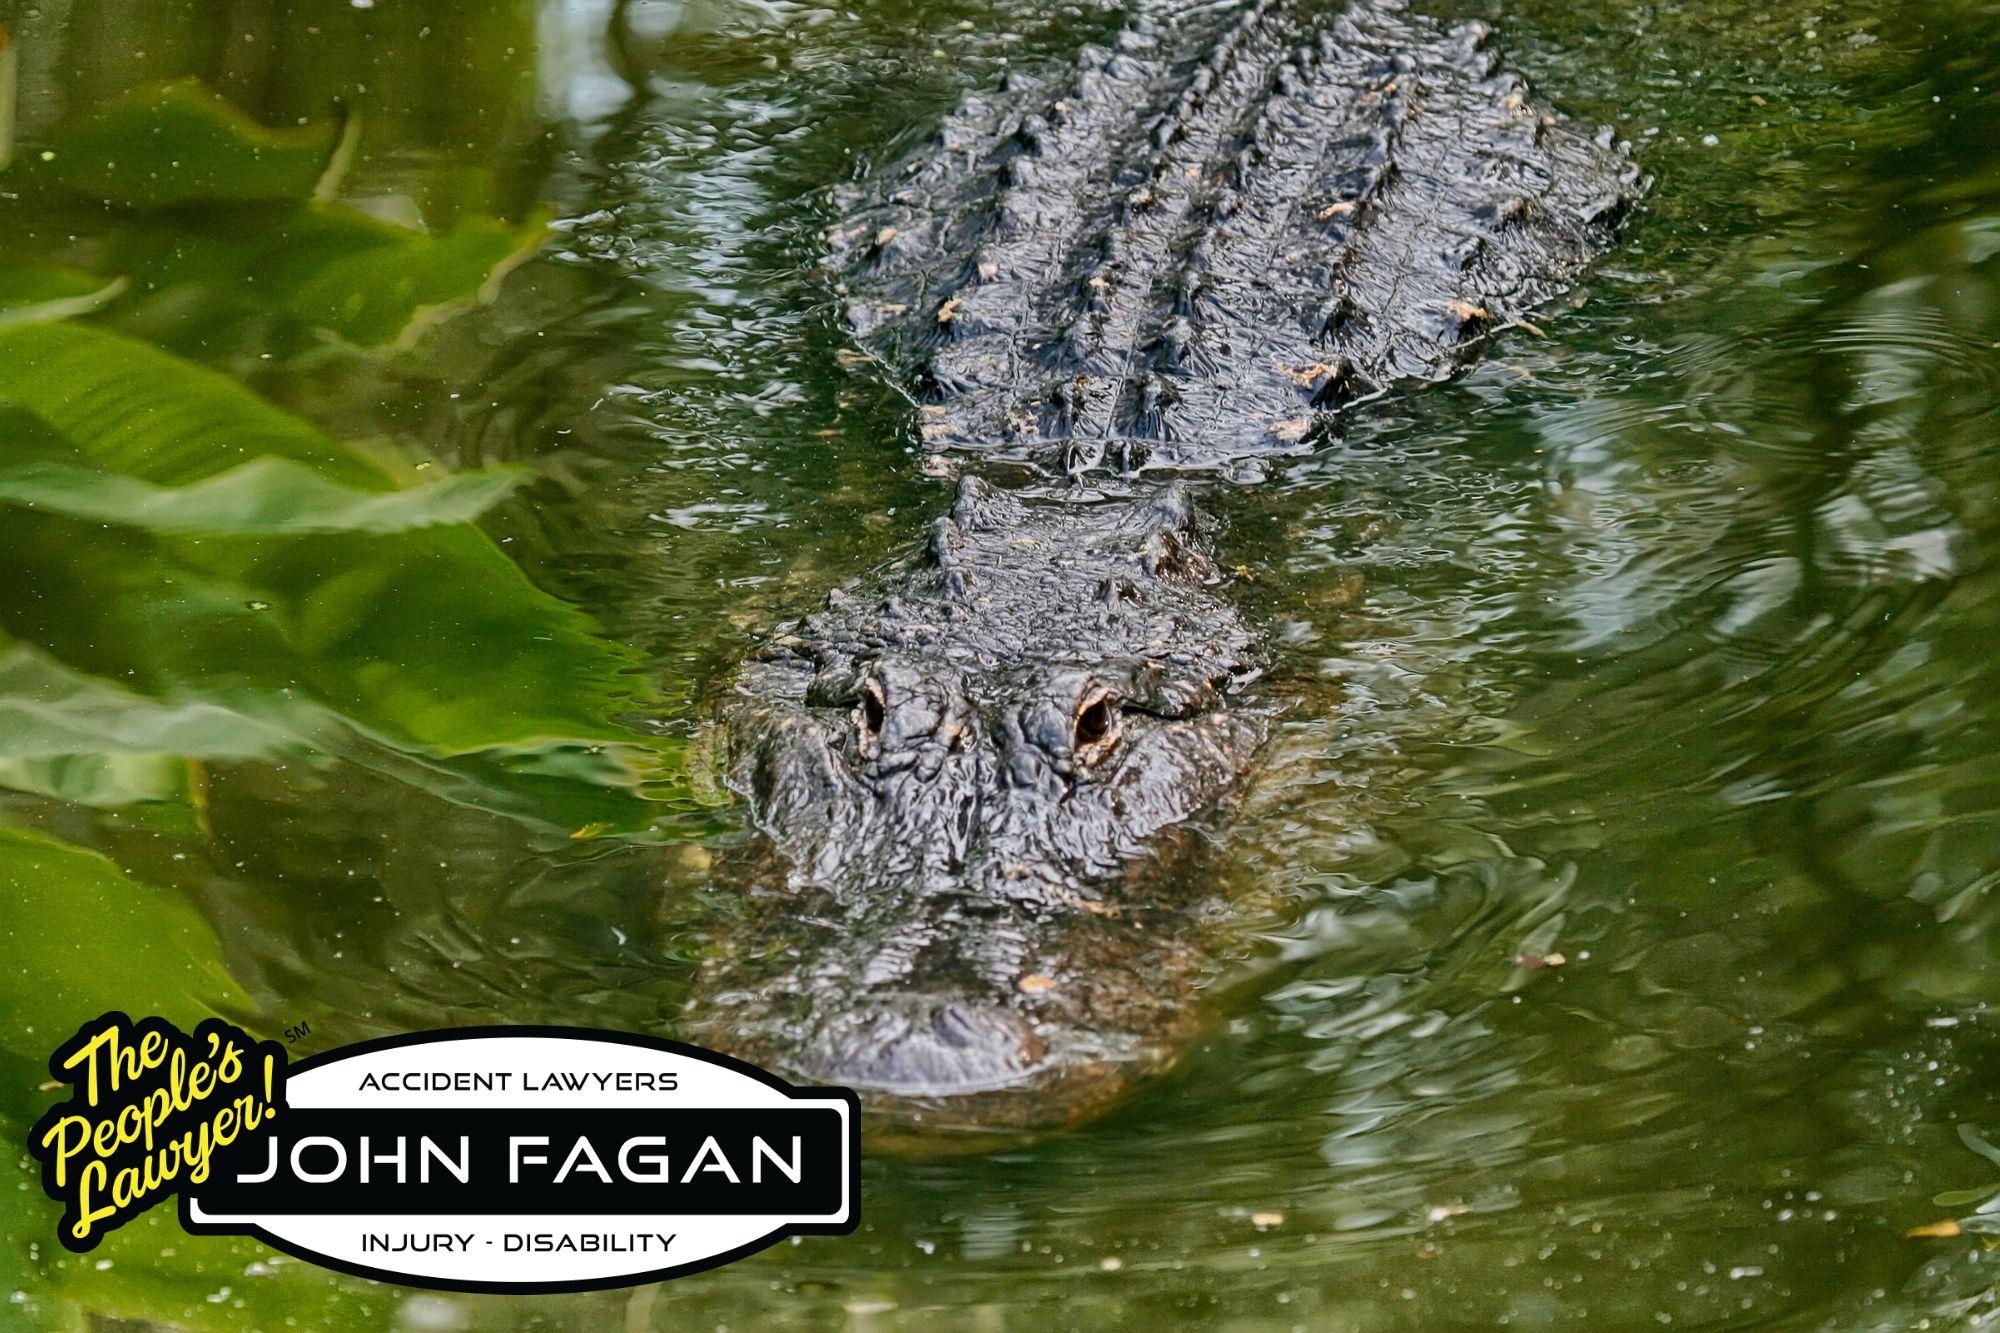 Alligator Safety Advice